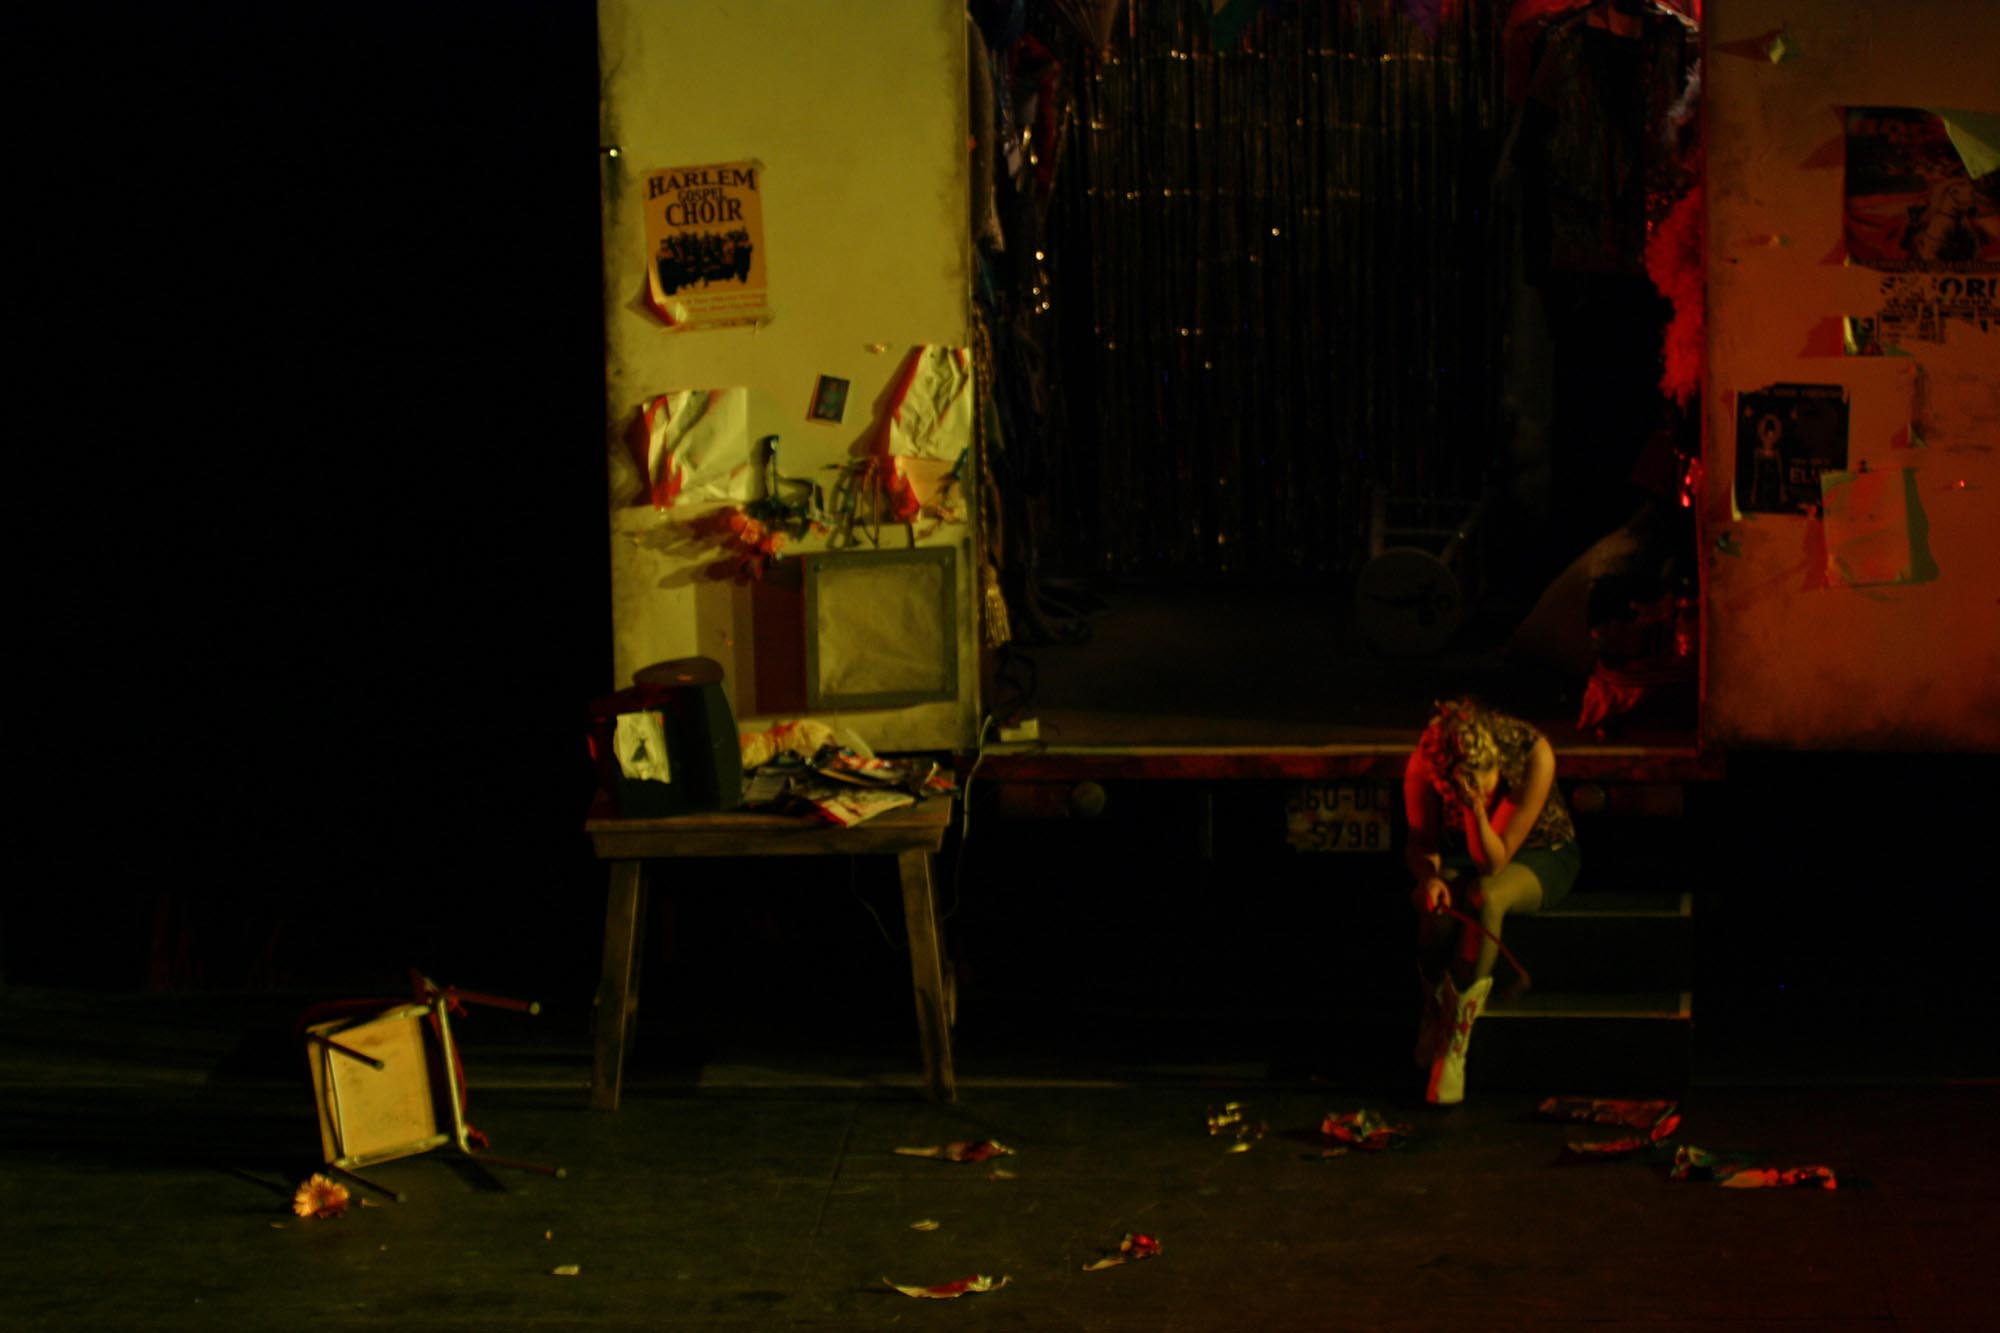 Pagliacci-Opera-Stage-Director-Jacopo-Spirei-3